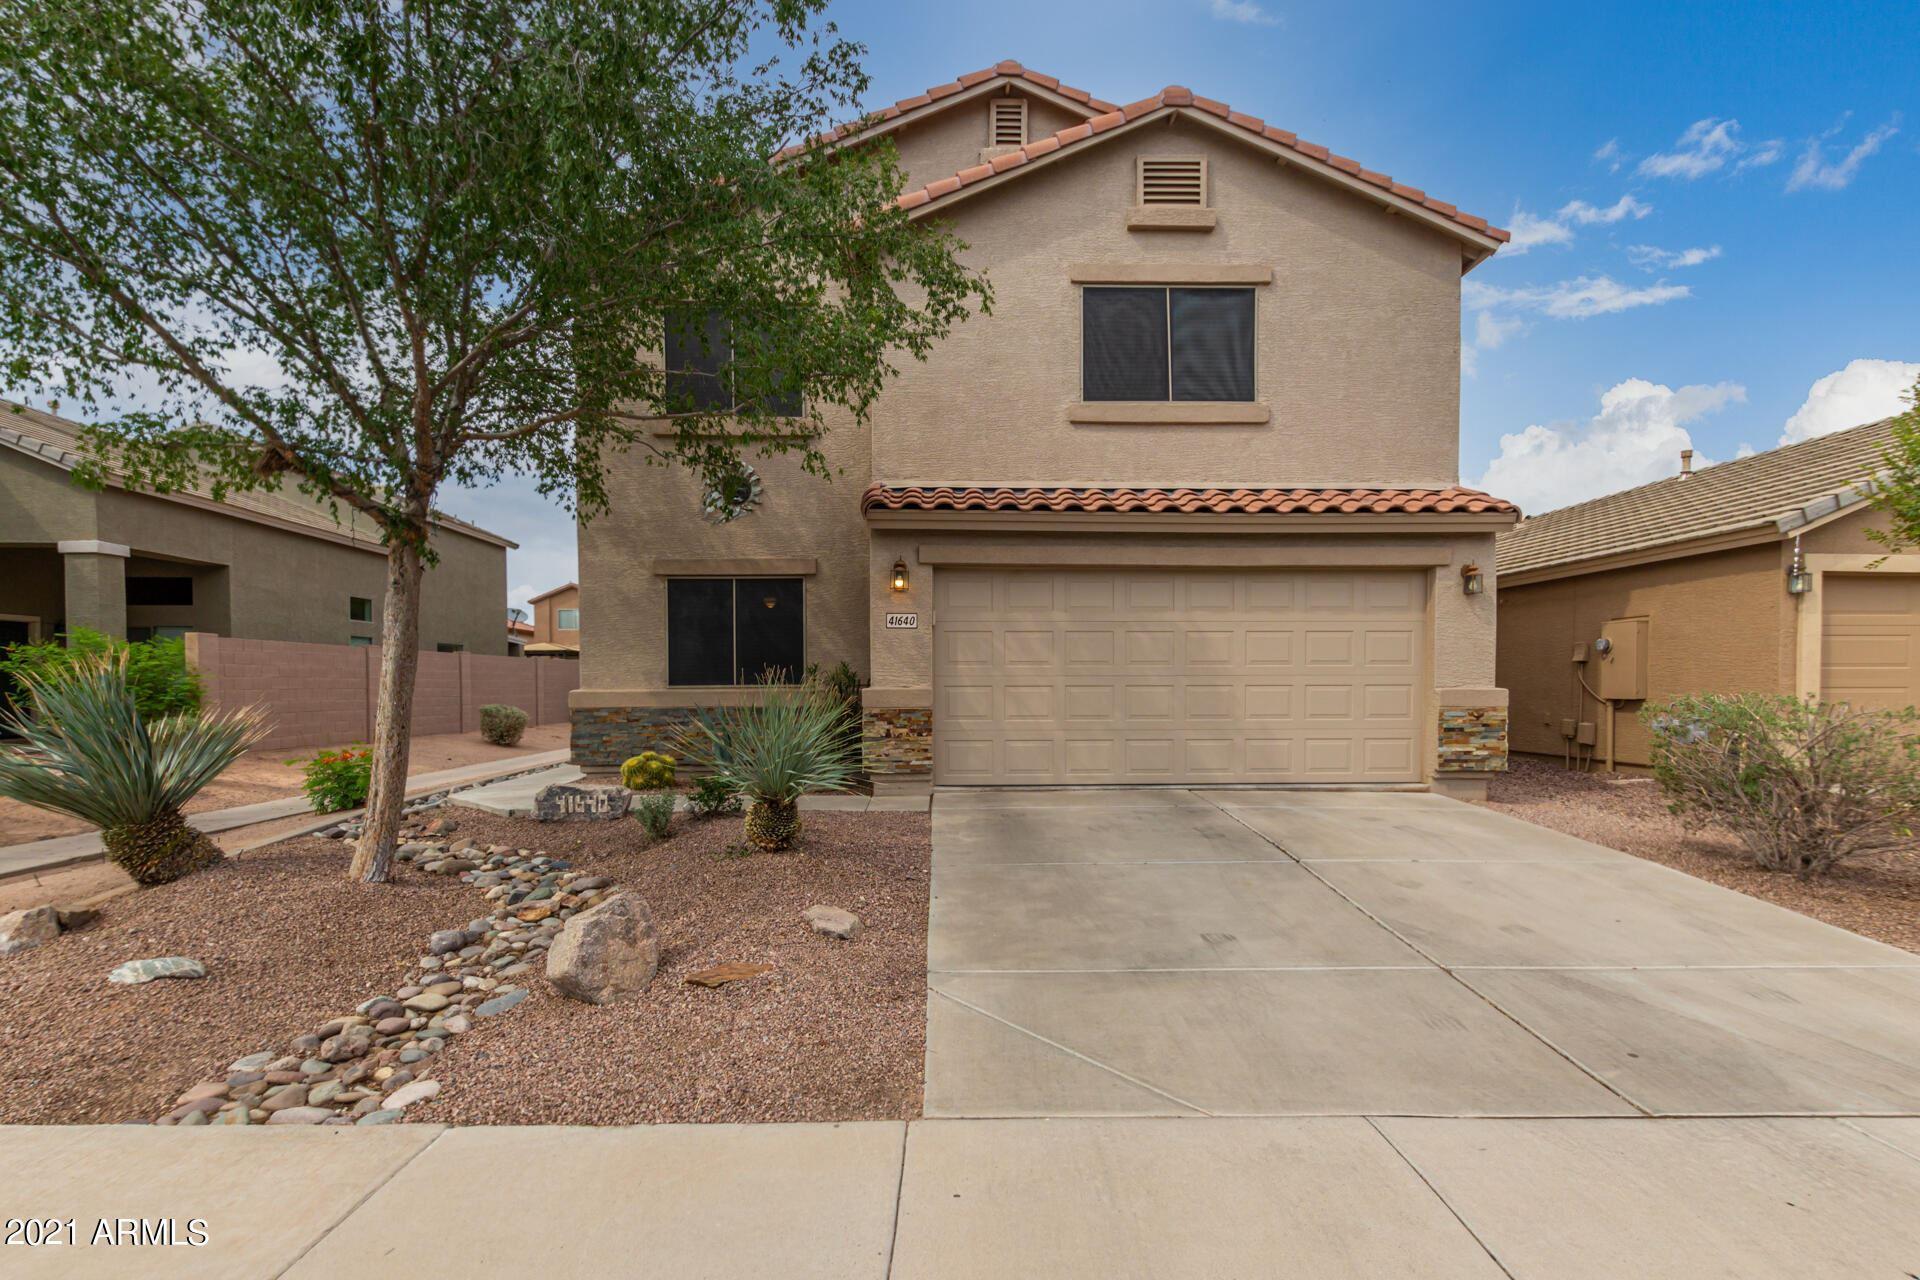 Photo for 41640 W SUNLAND Drive, Maricopa, AZ 85138 (MLS # 6269609)